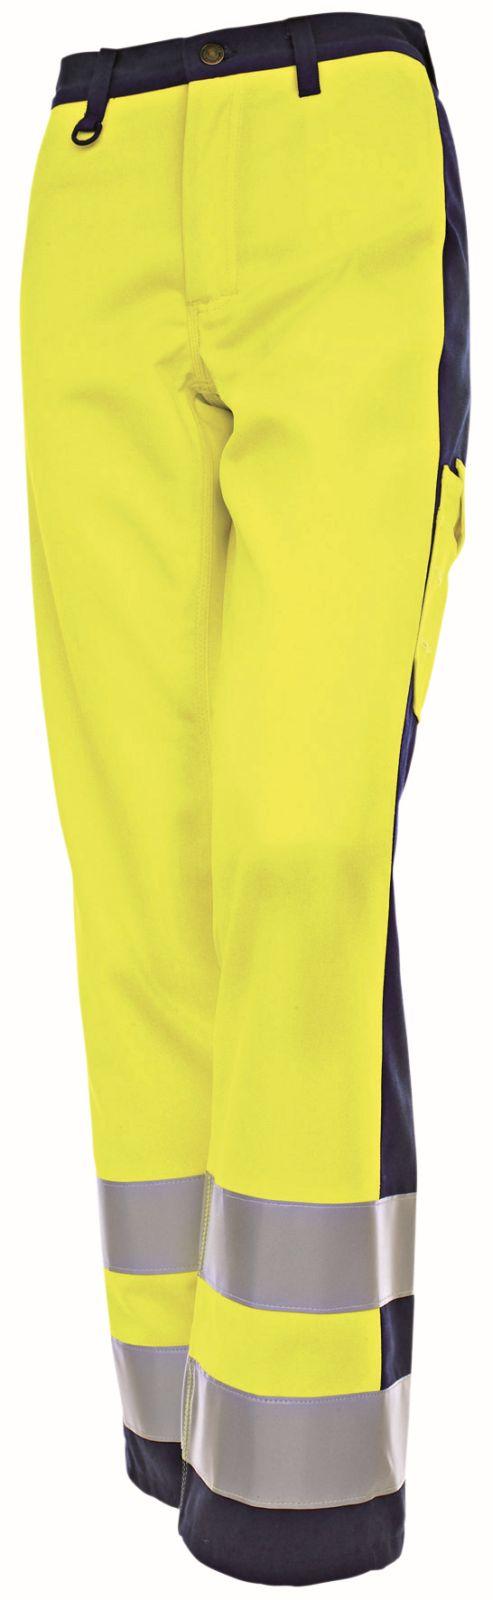 Blaklader Dames werkbroeken 15931804 High Vis geel-marineblauw(3389)